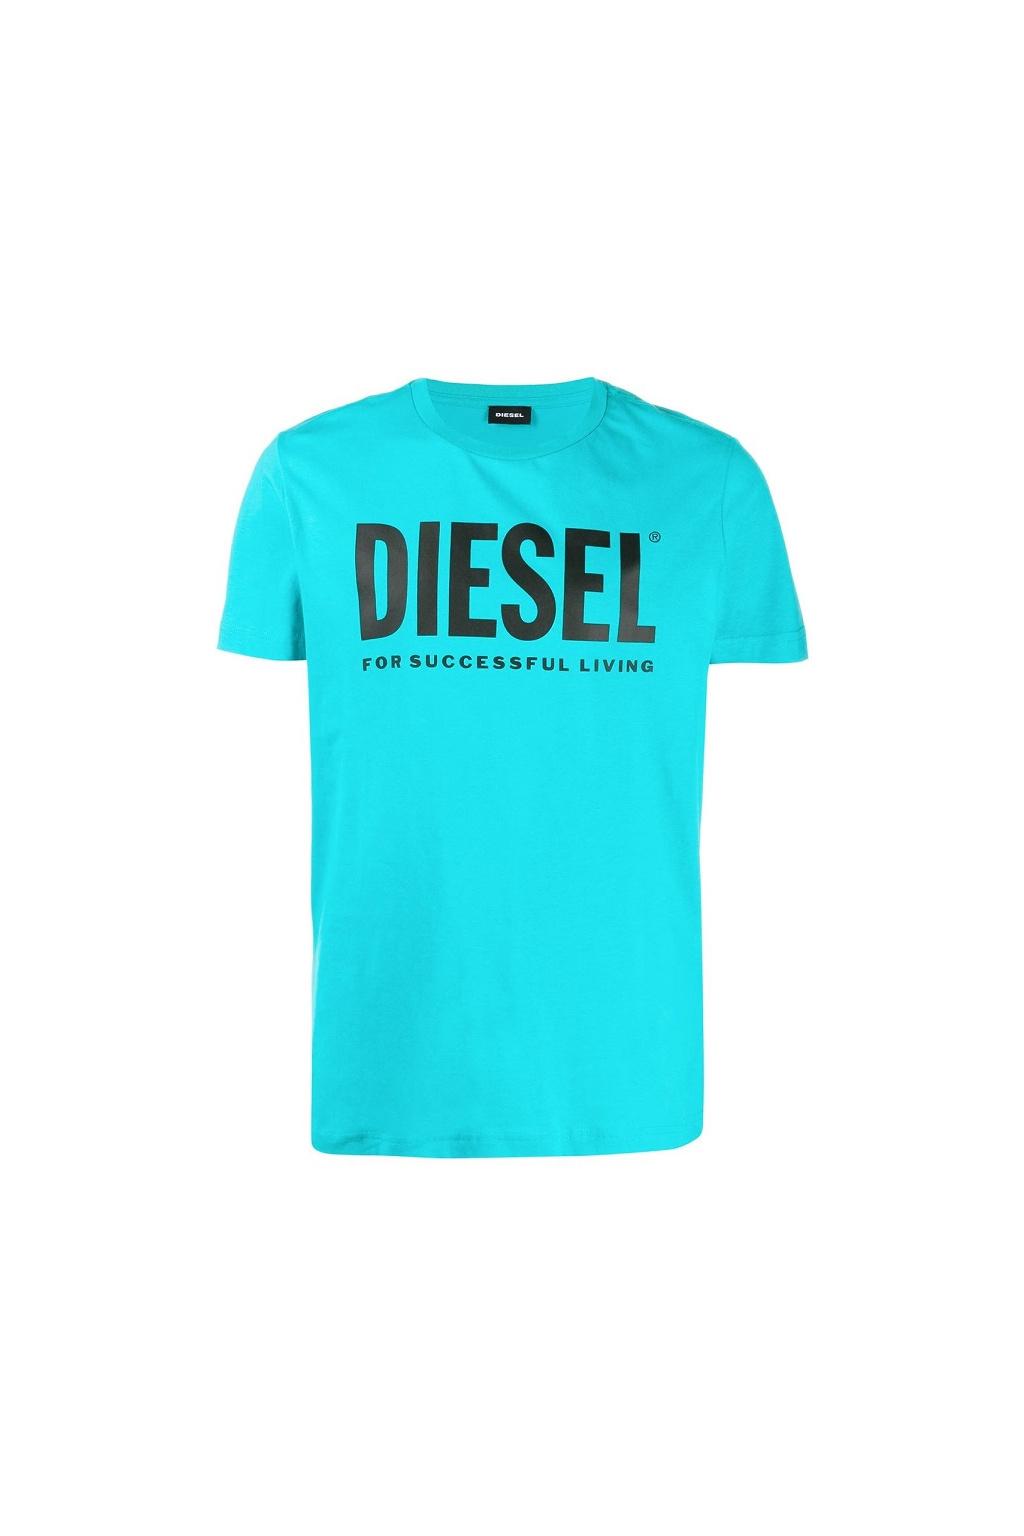 00SXED 0AAXJ Pánské Diesel tričko T Diego Logo zelené